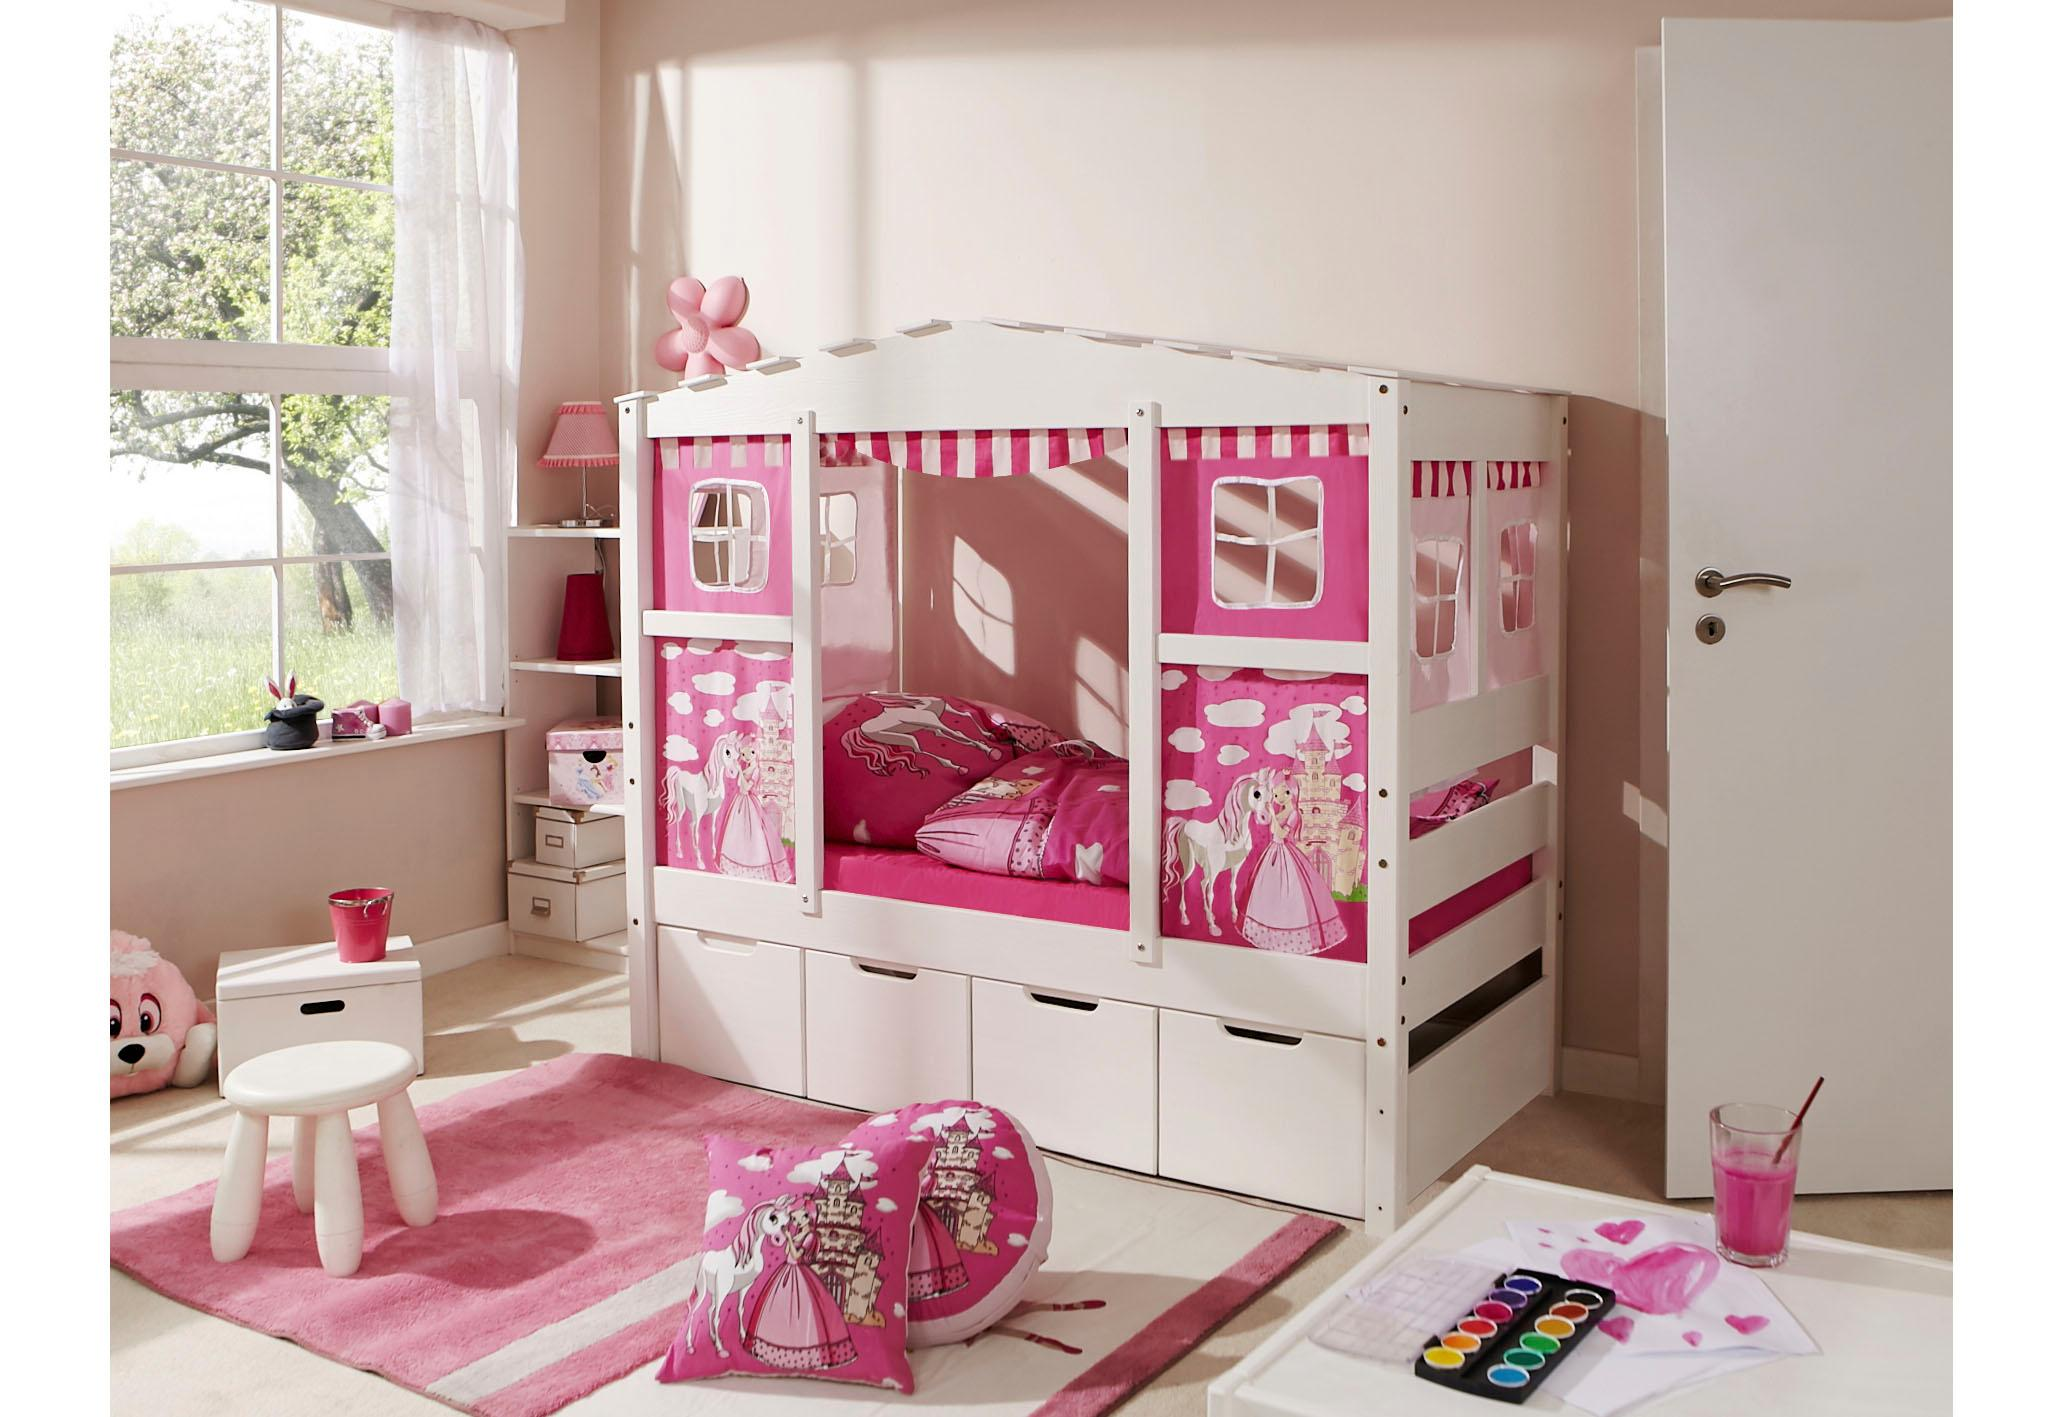 Ticaa Hausbett Lio rosa Kinder Kinderbetten Kindermöbel